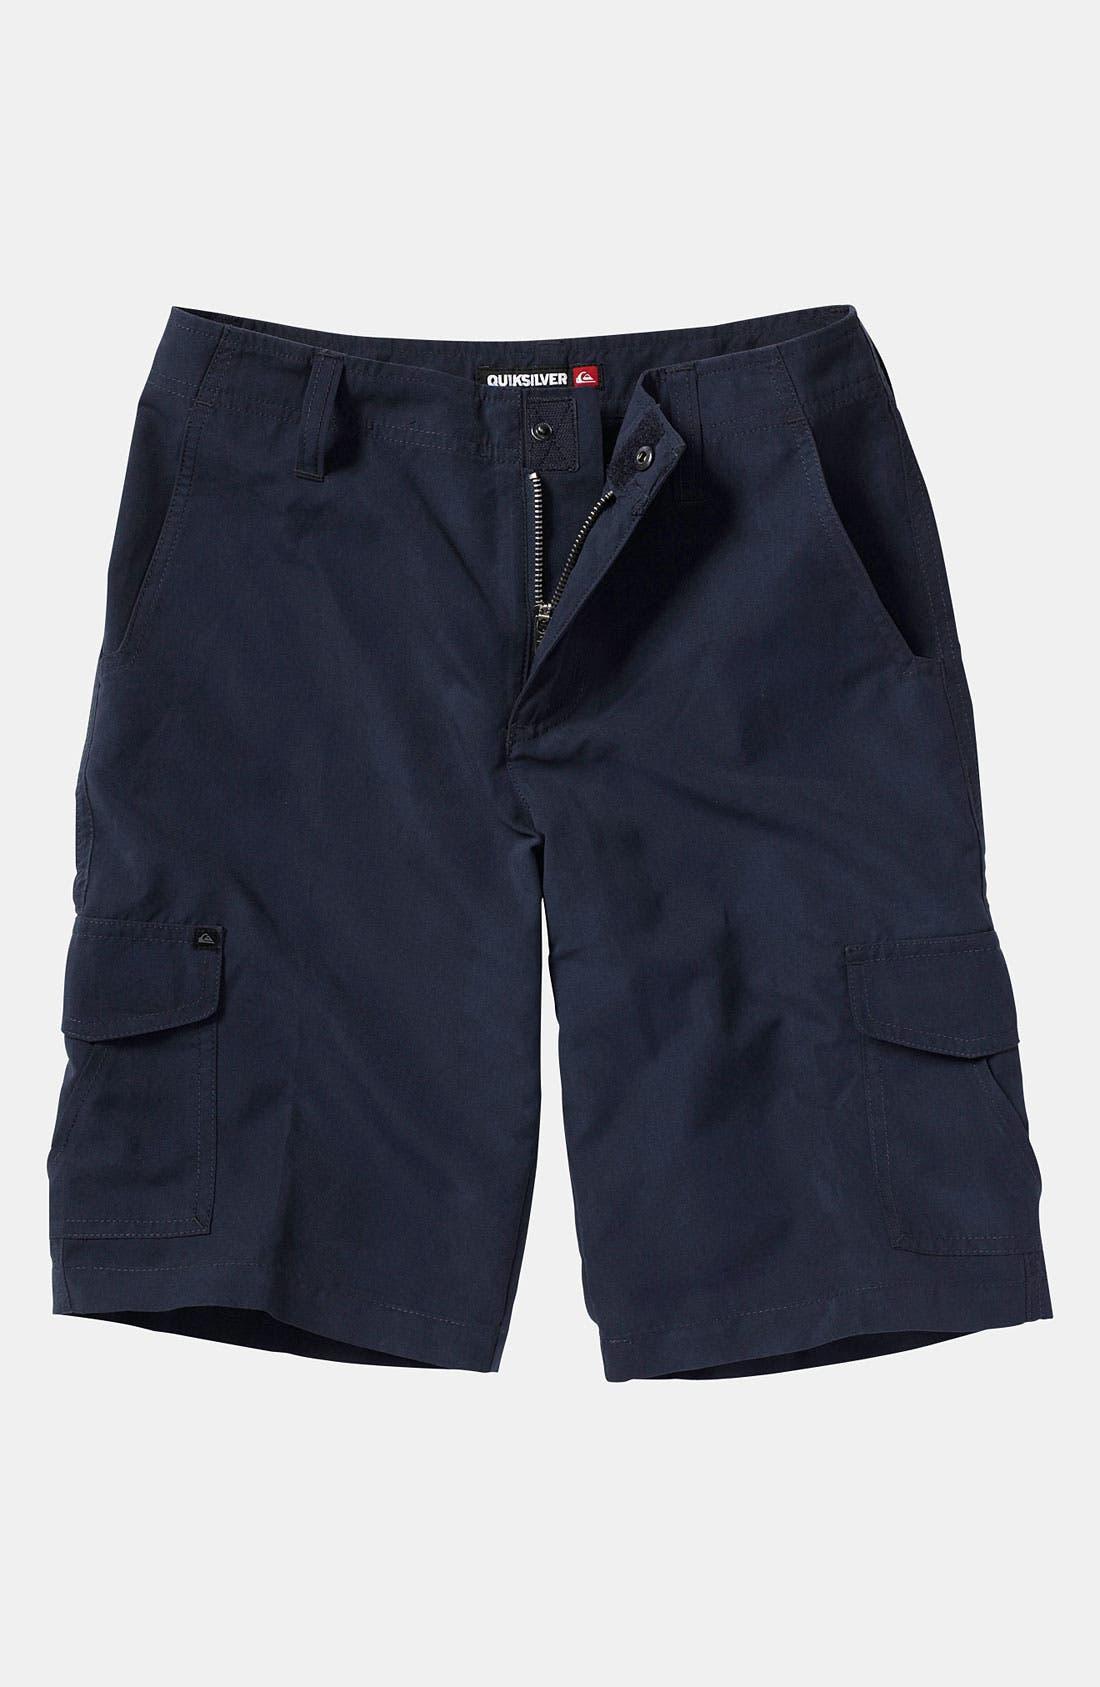 Alternate Image 1 Selected - Quiksilver 'Phofilled' Shorts (Infant)